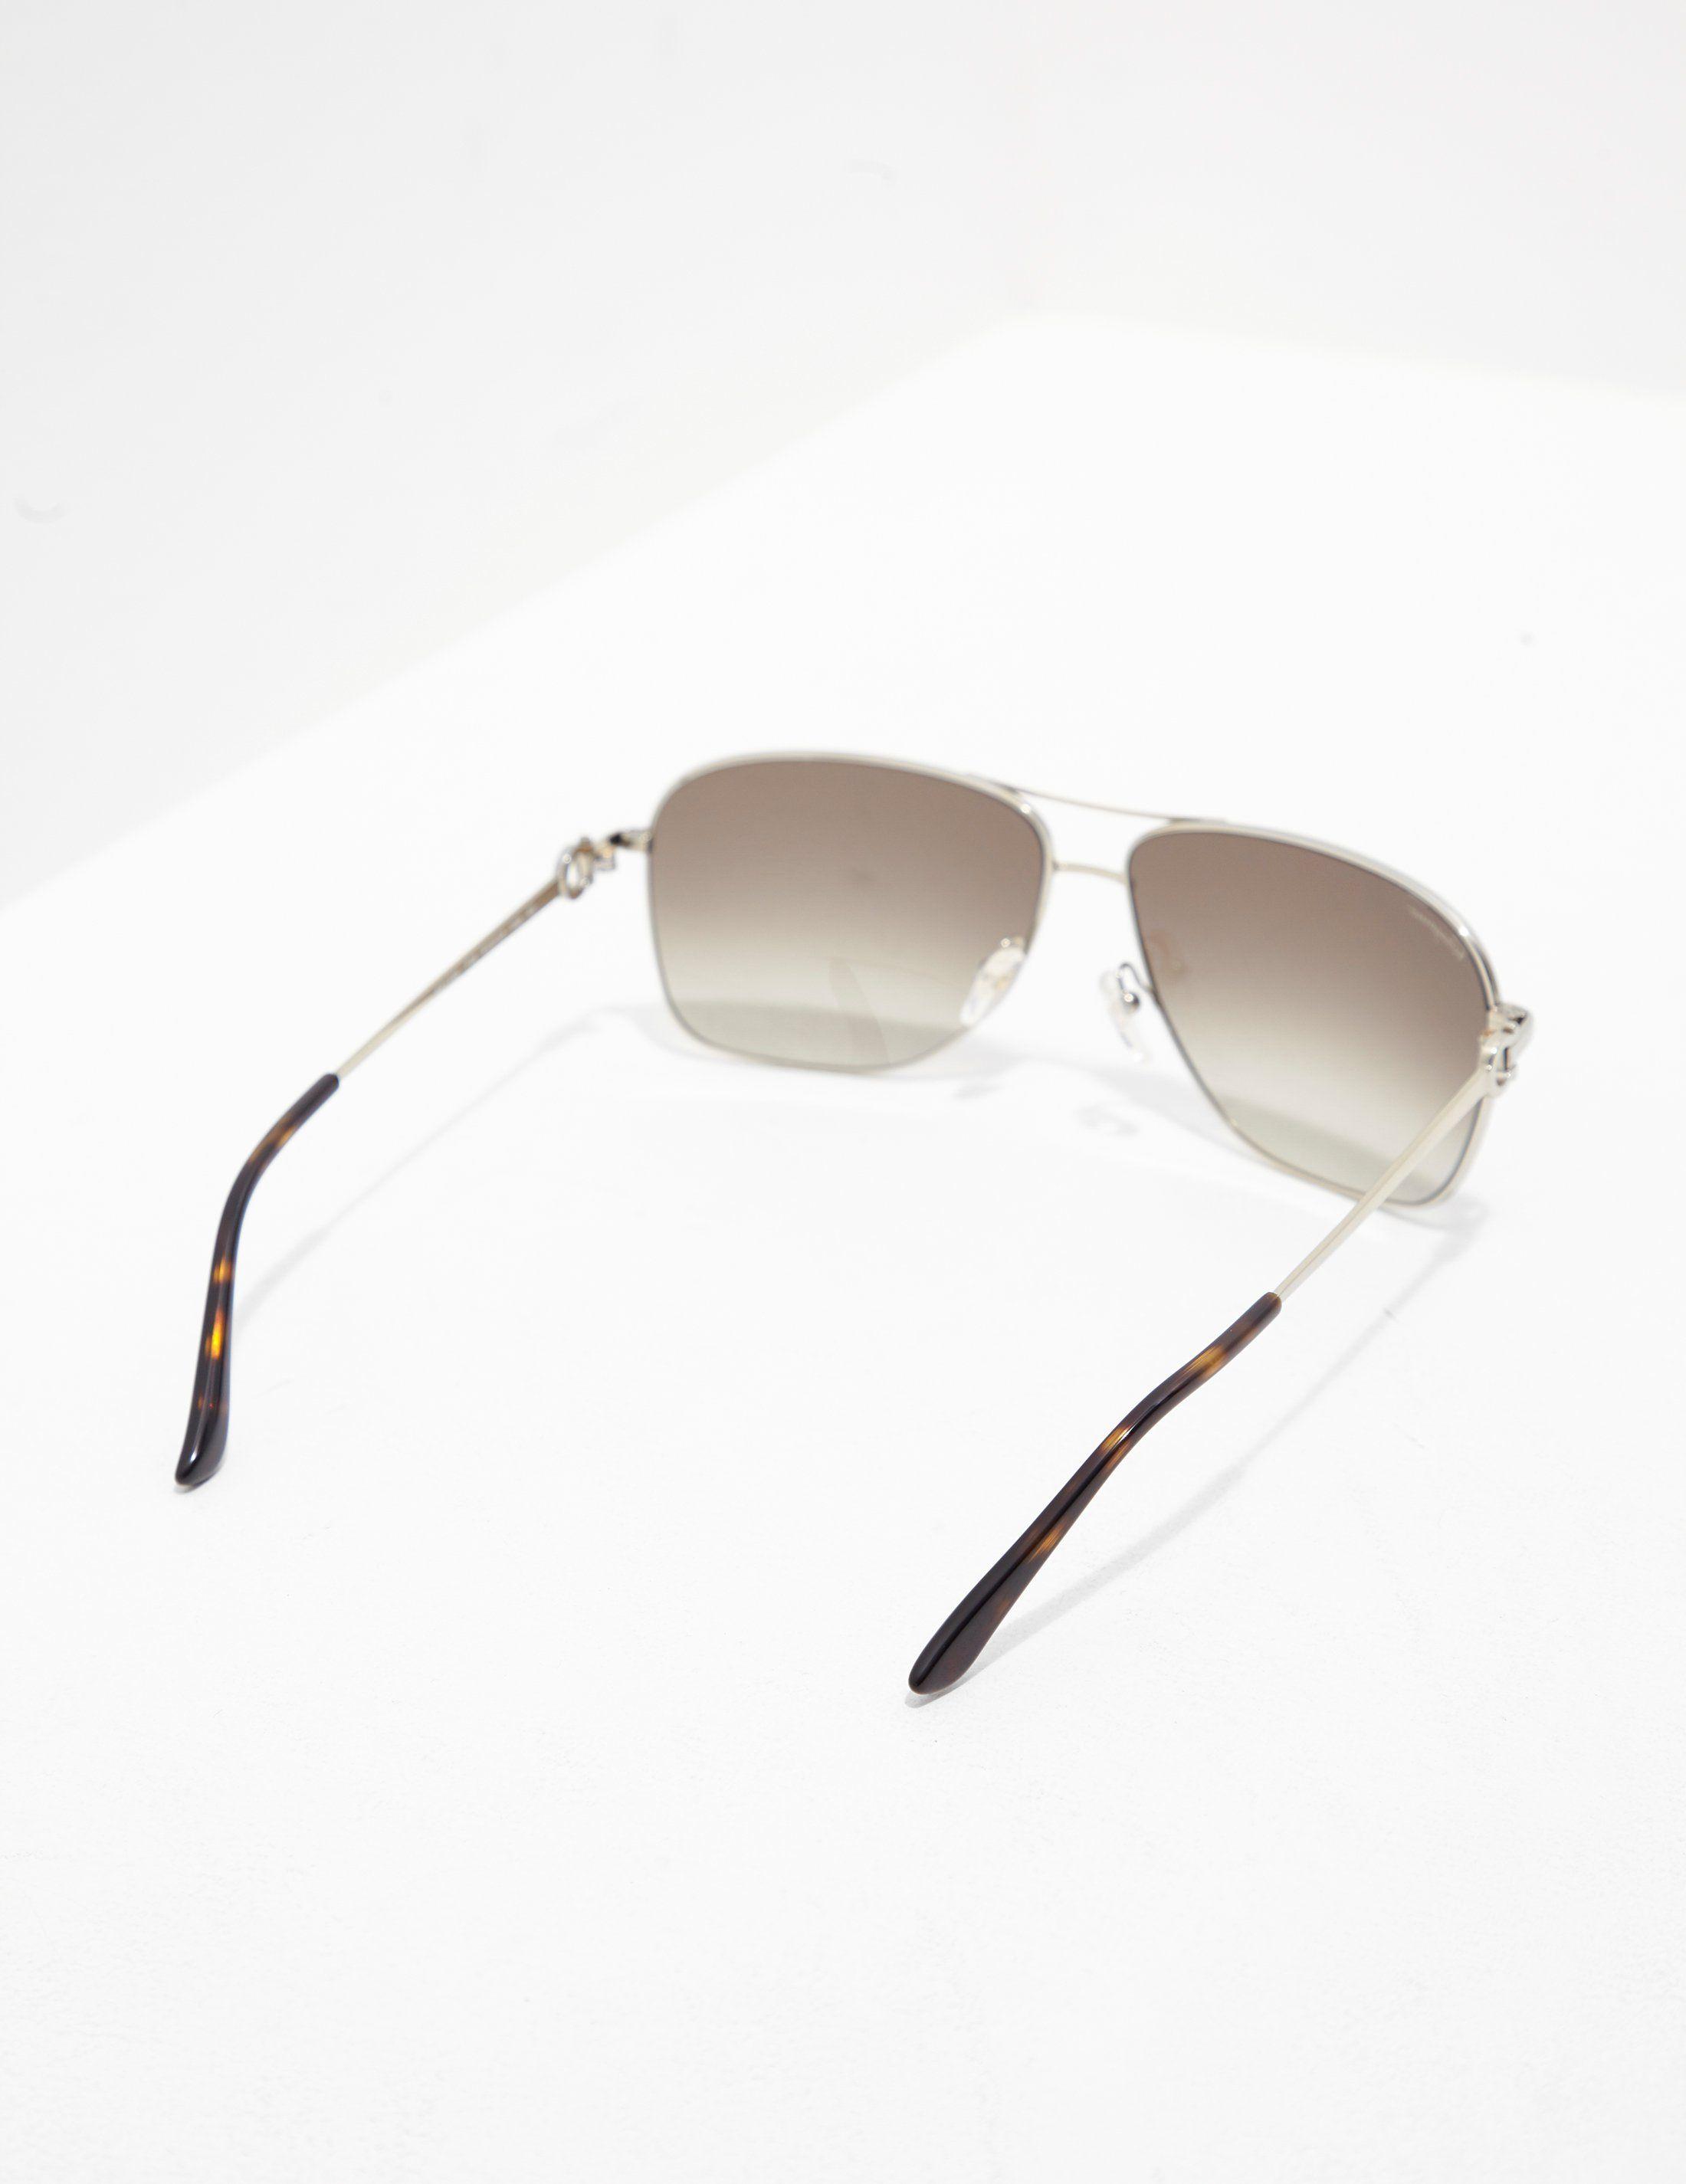 Salvatore Ferragamo Square Aviator Sunglasses - Online Exclusive